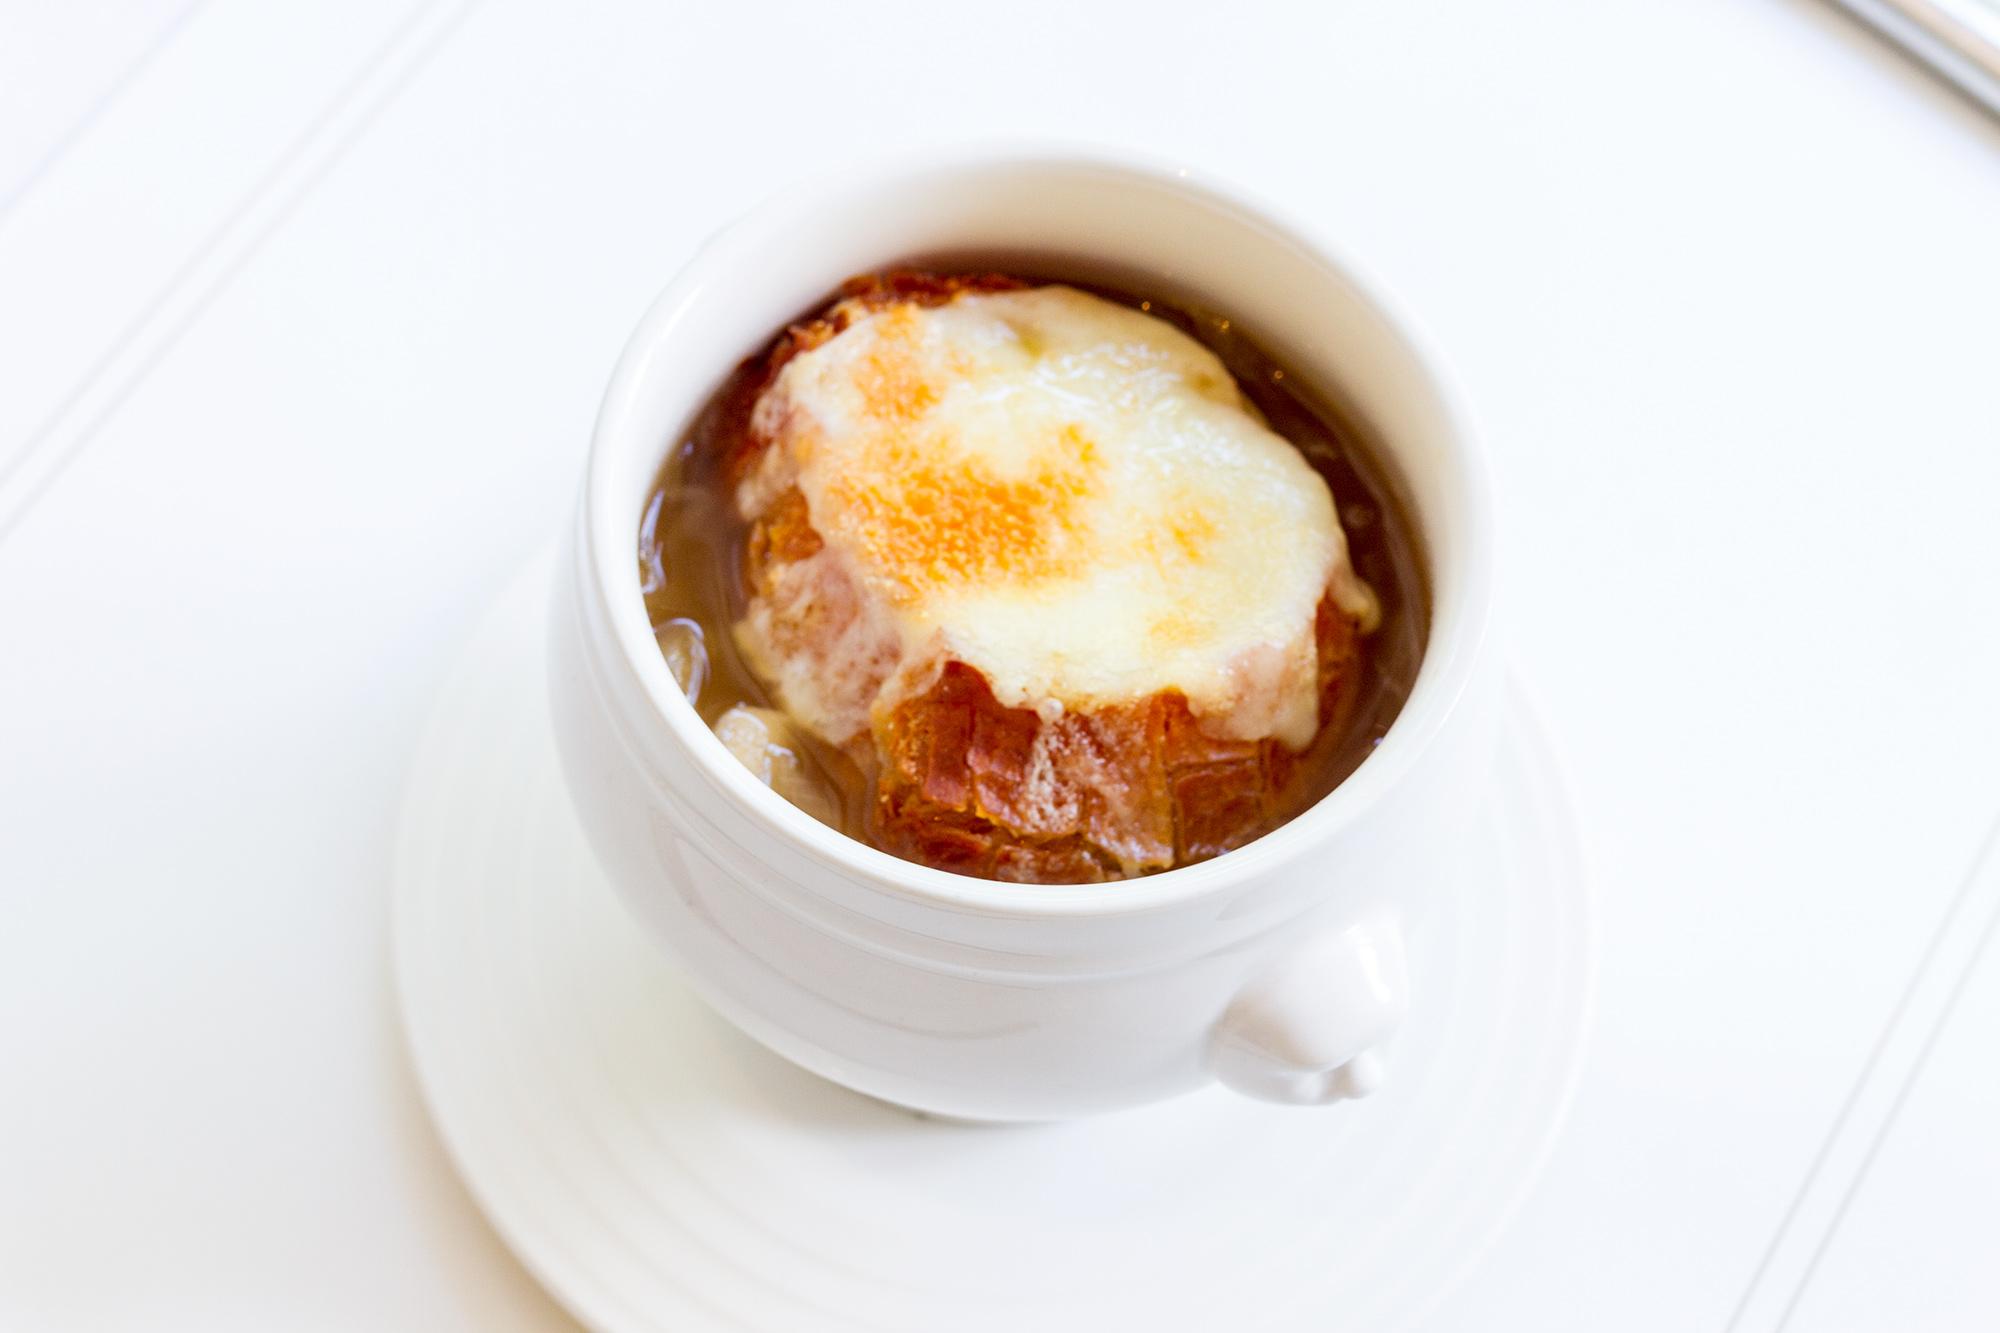 Onion soup  Cafe Claire คาเฟ่แคลร์ โรงแรมโอเรียนเต็ล เรสซิเดนซ์ กรุงเทพฯ Onion soup